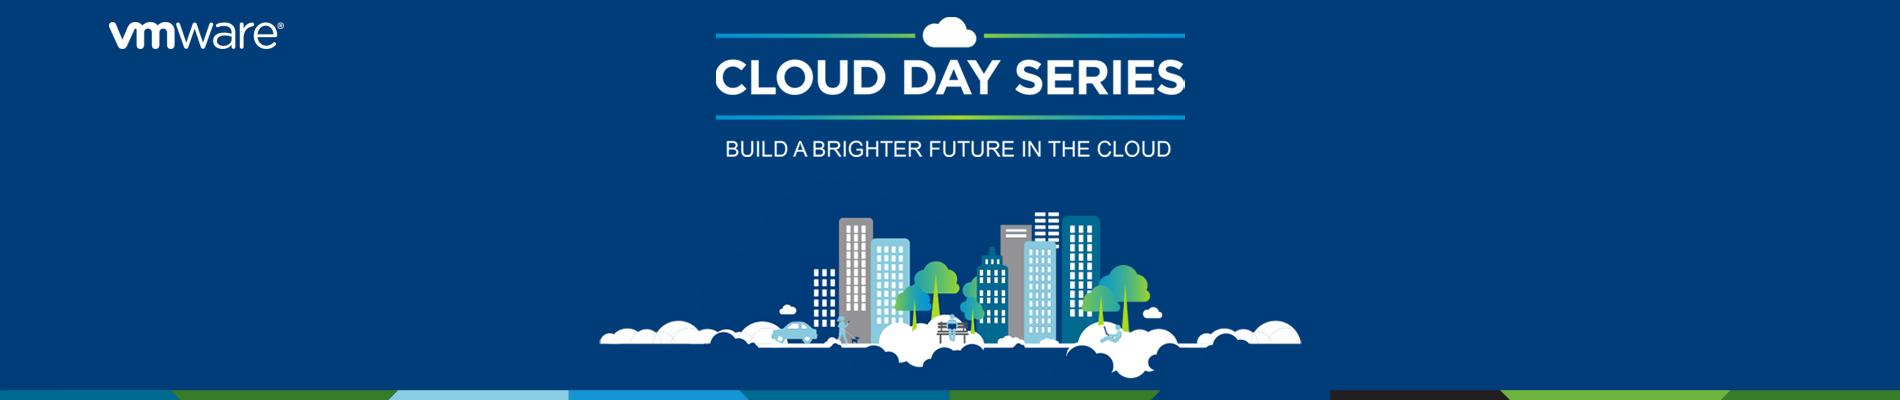 VMware Cloud Day Banner